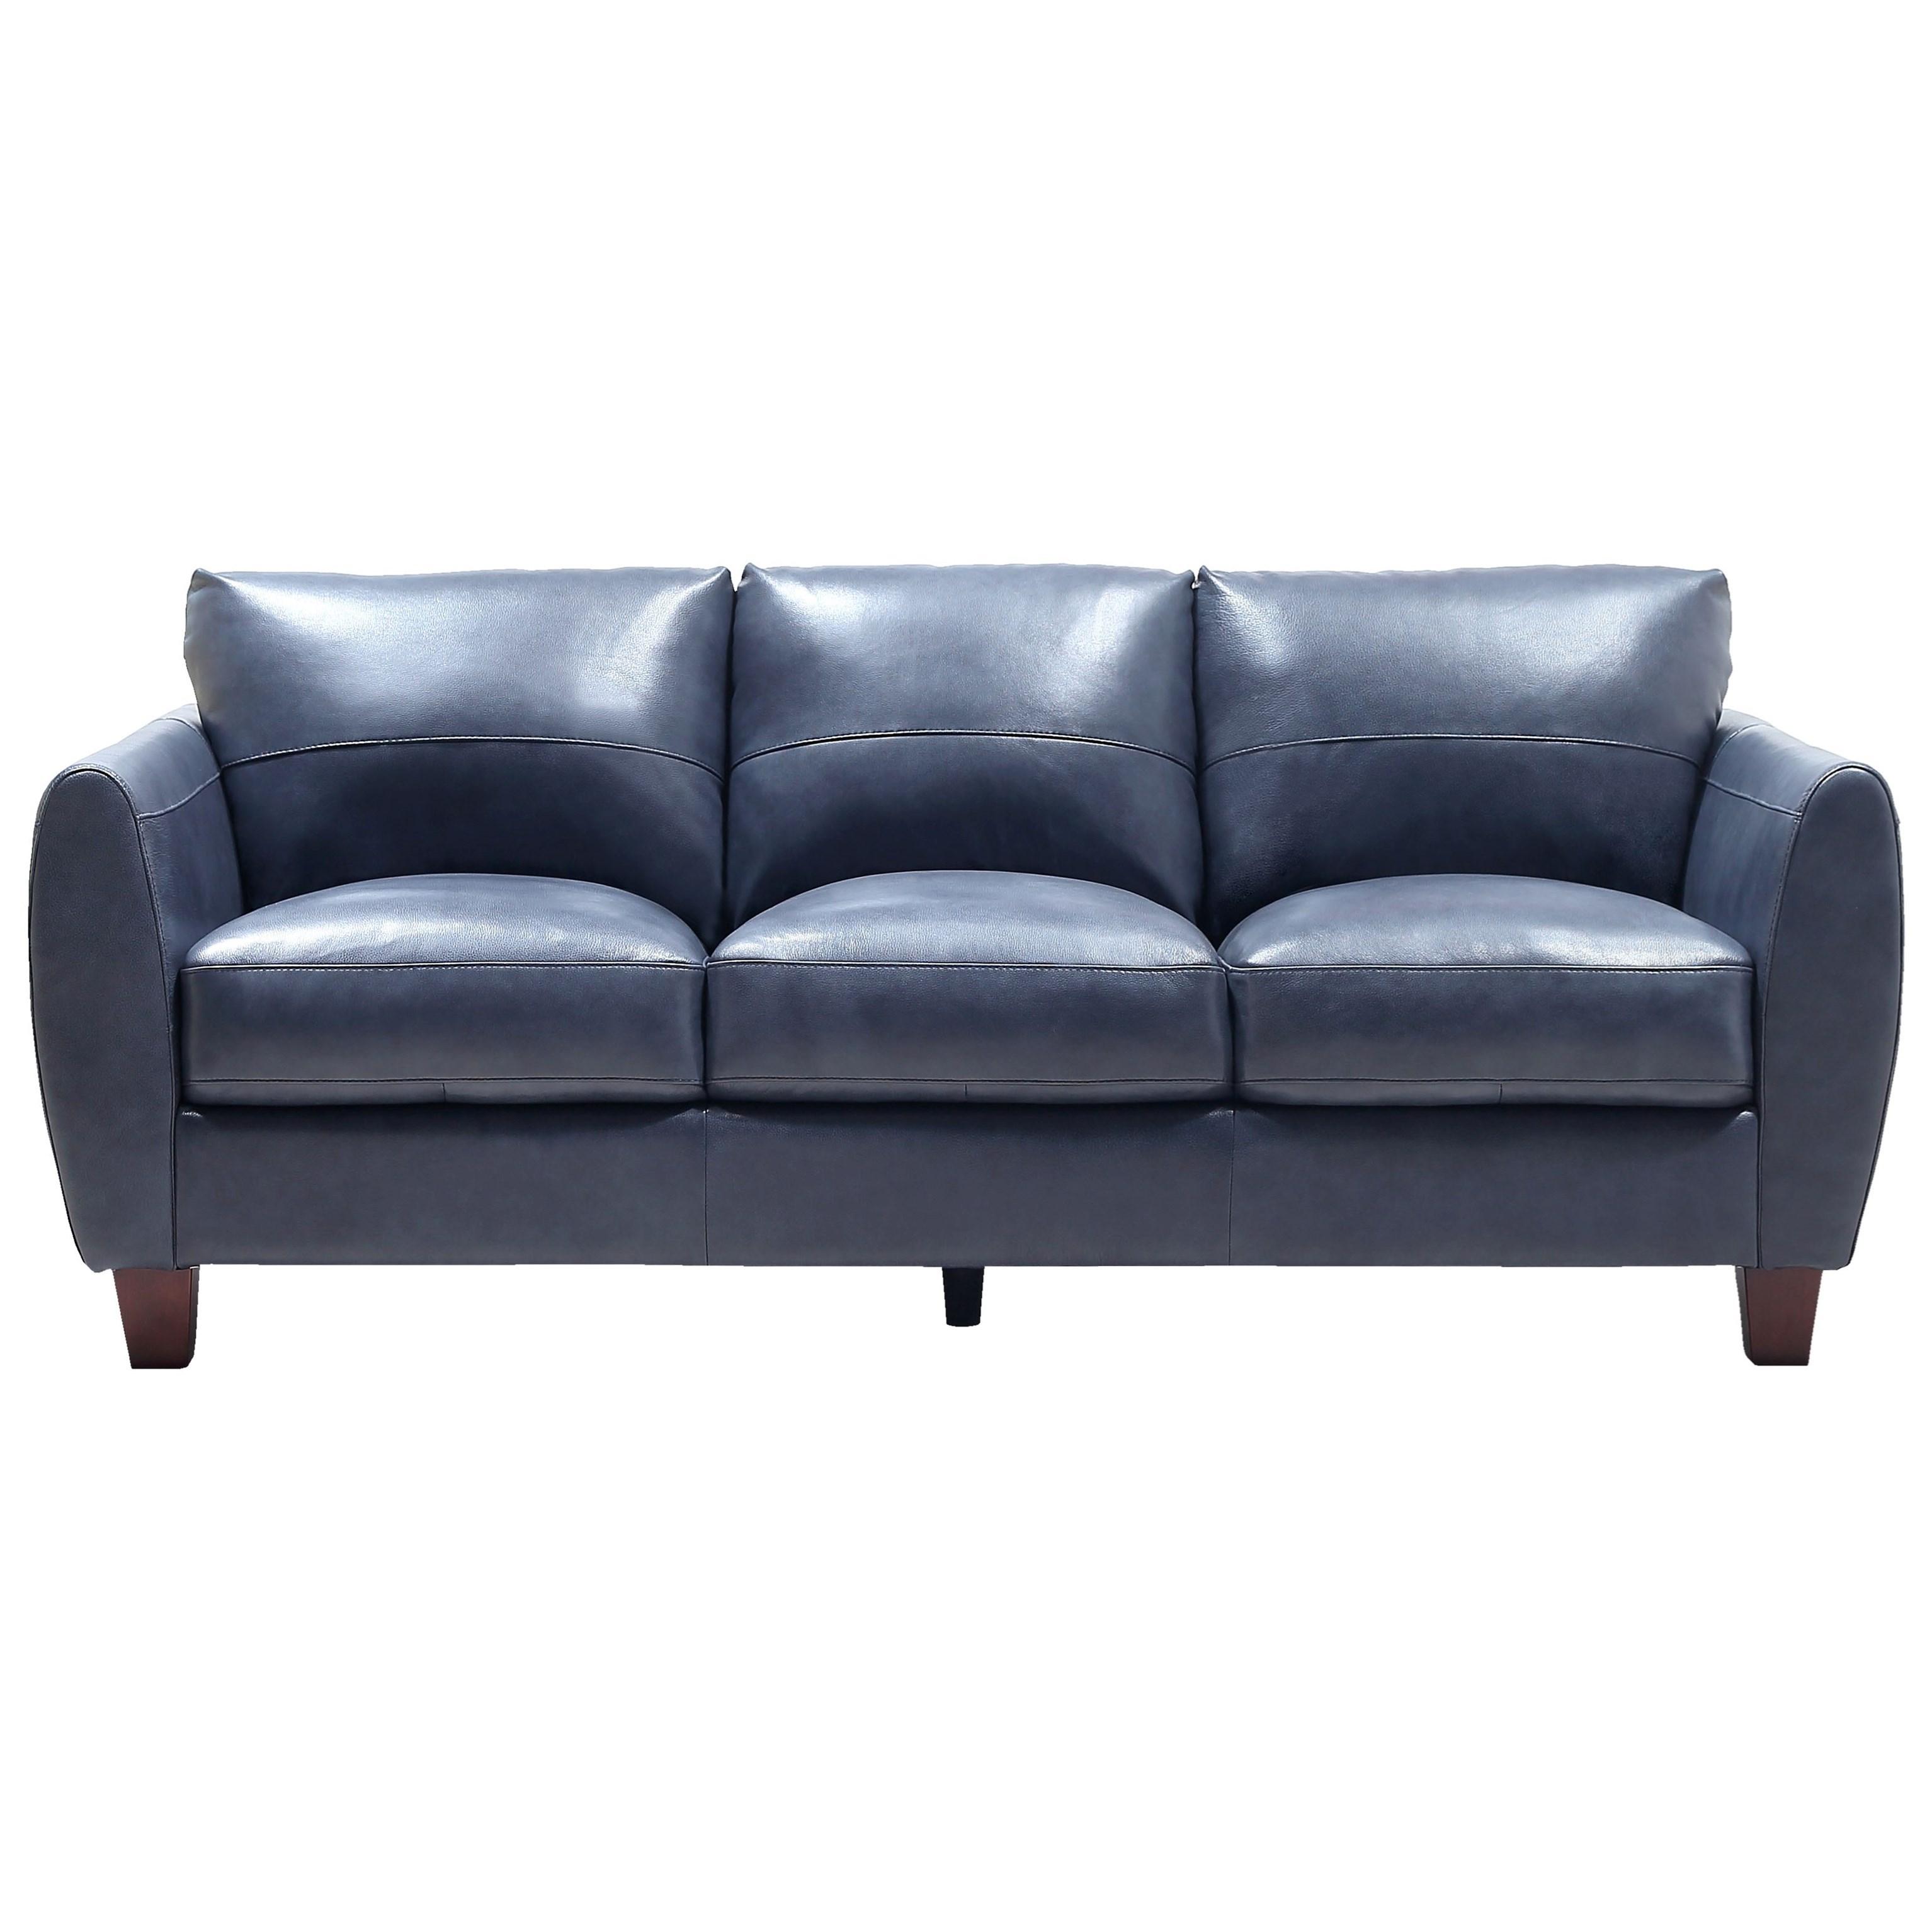 Traverse Sofa by Leather Italia USA at Johnny Janosik